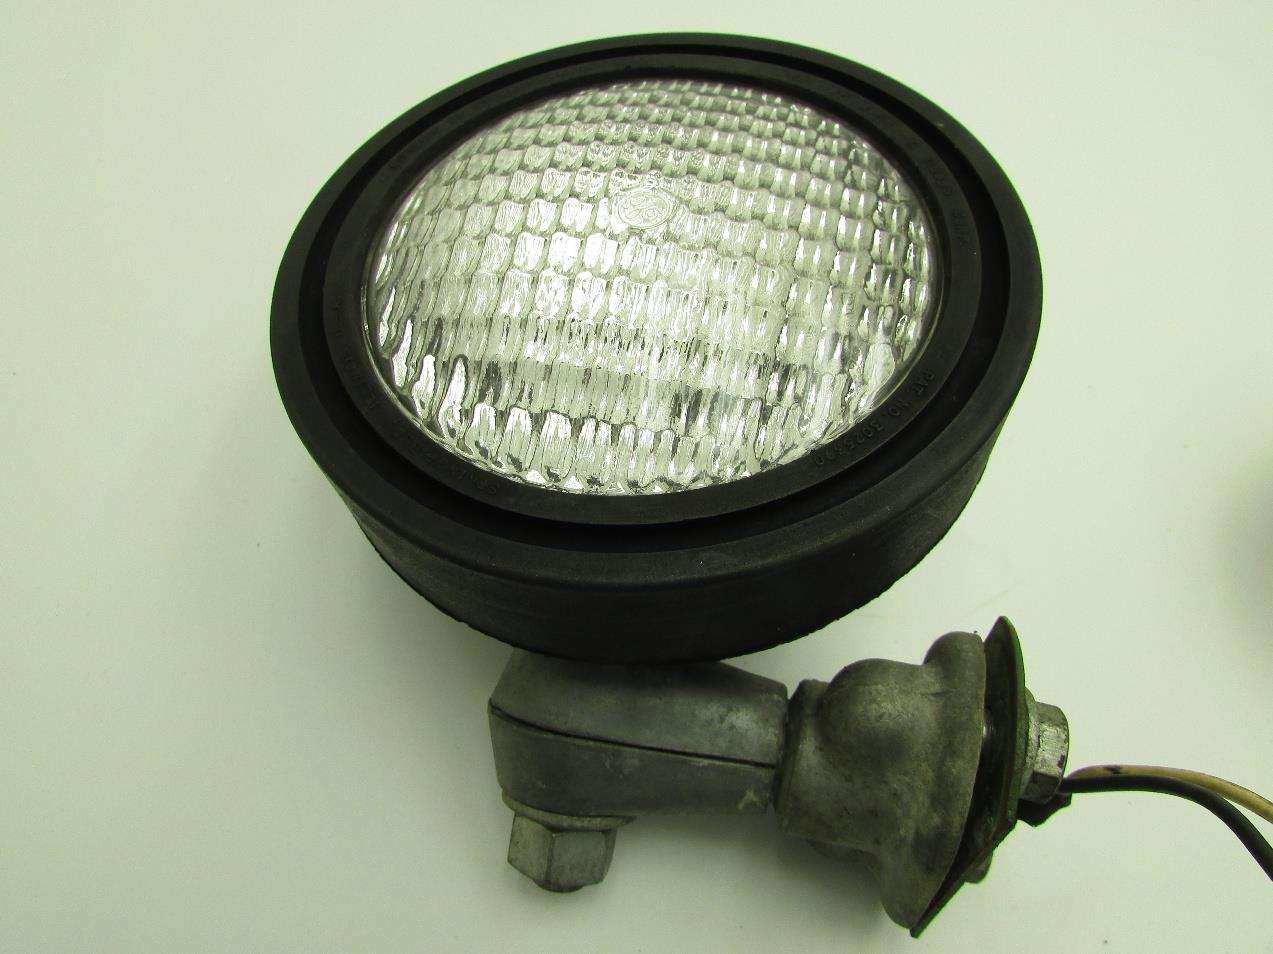 John Deere 110 Headlight Parts Www Backhoe Fuse Box Diagram Round Fender Garden Tractor Headlights